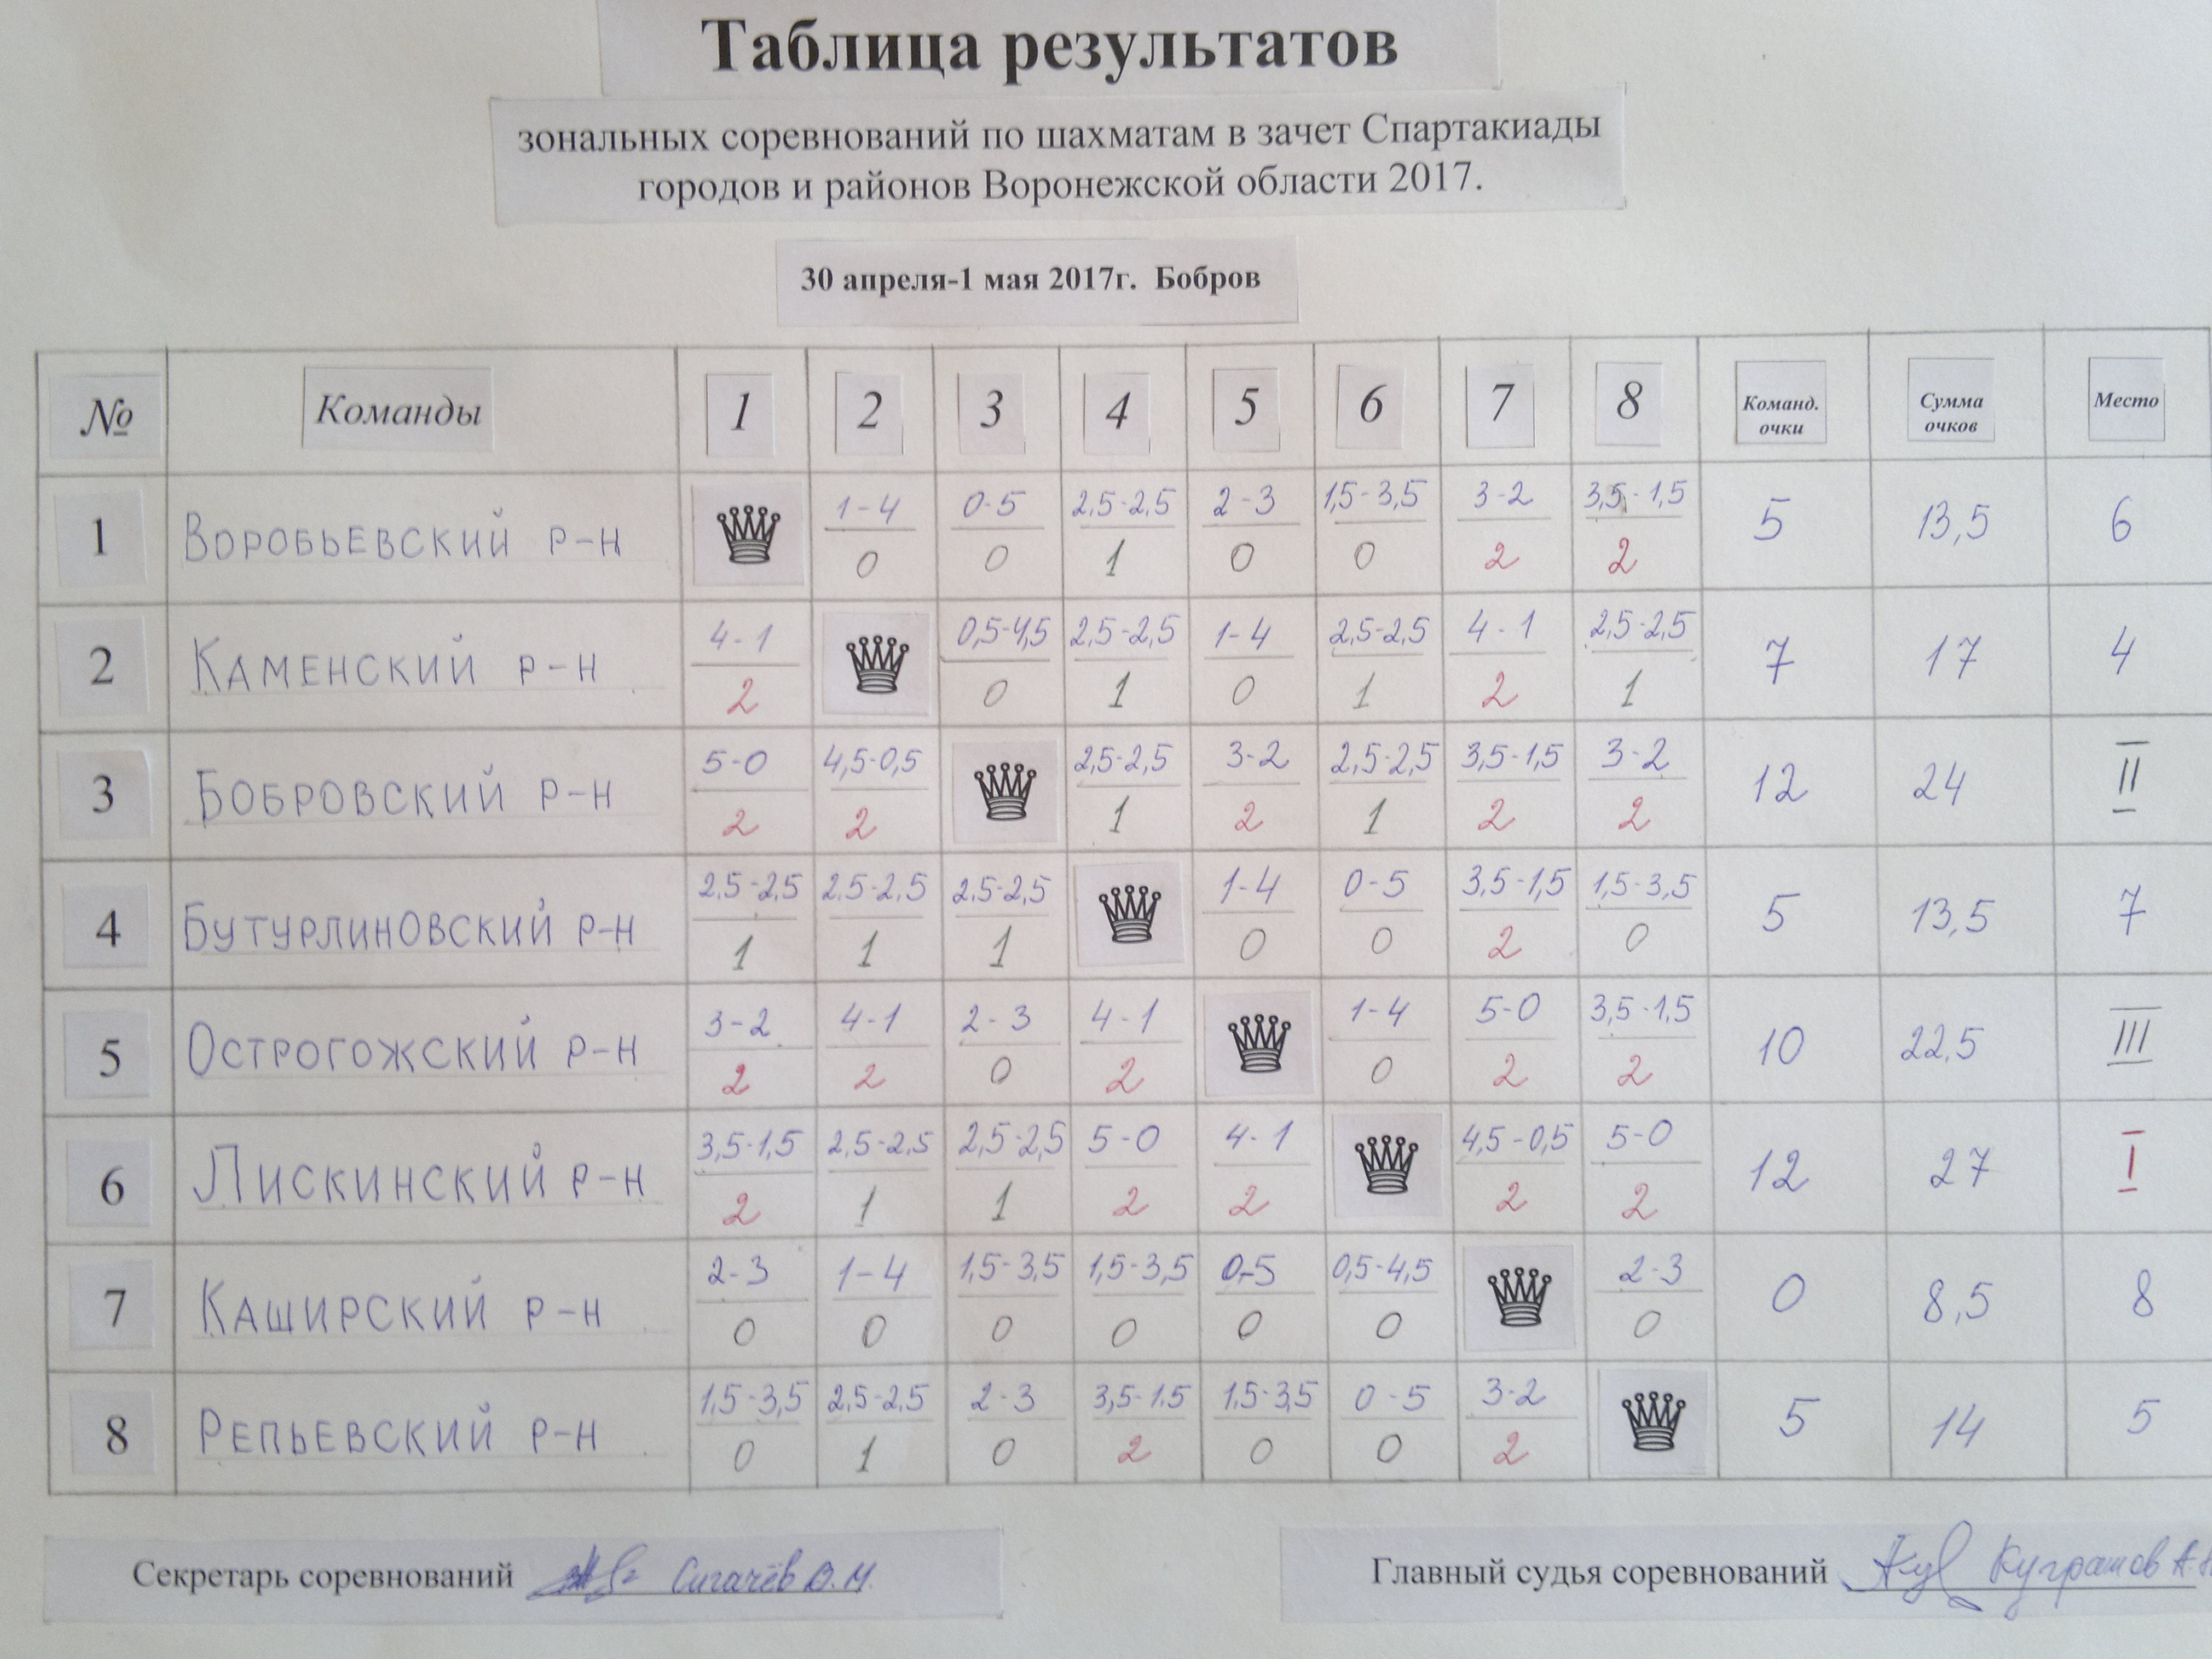 http://s1.uploads.ru/t27XT.jpg